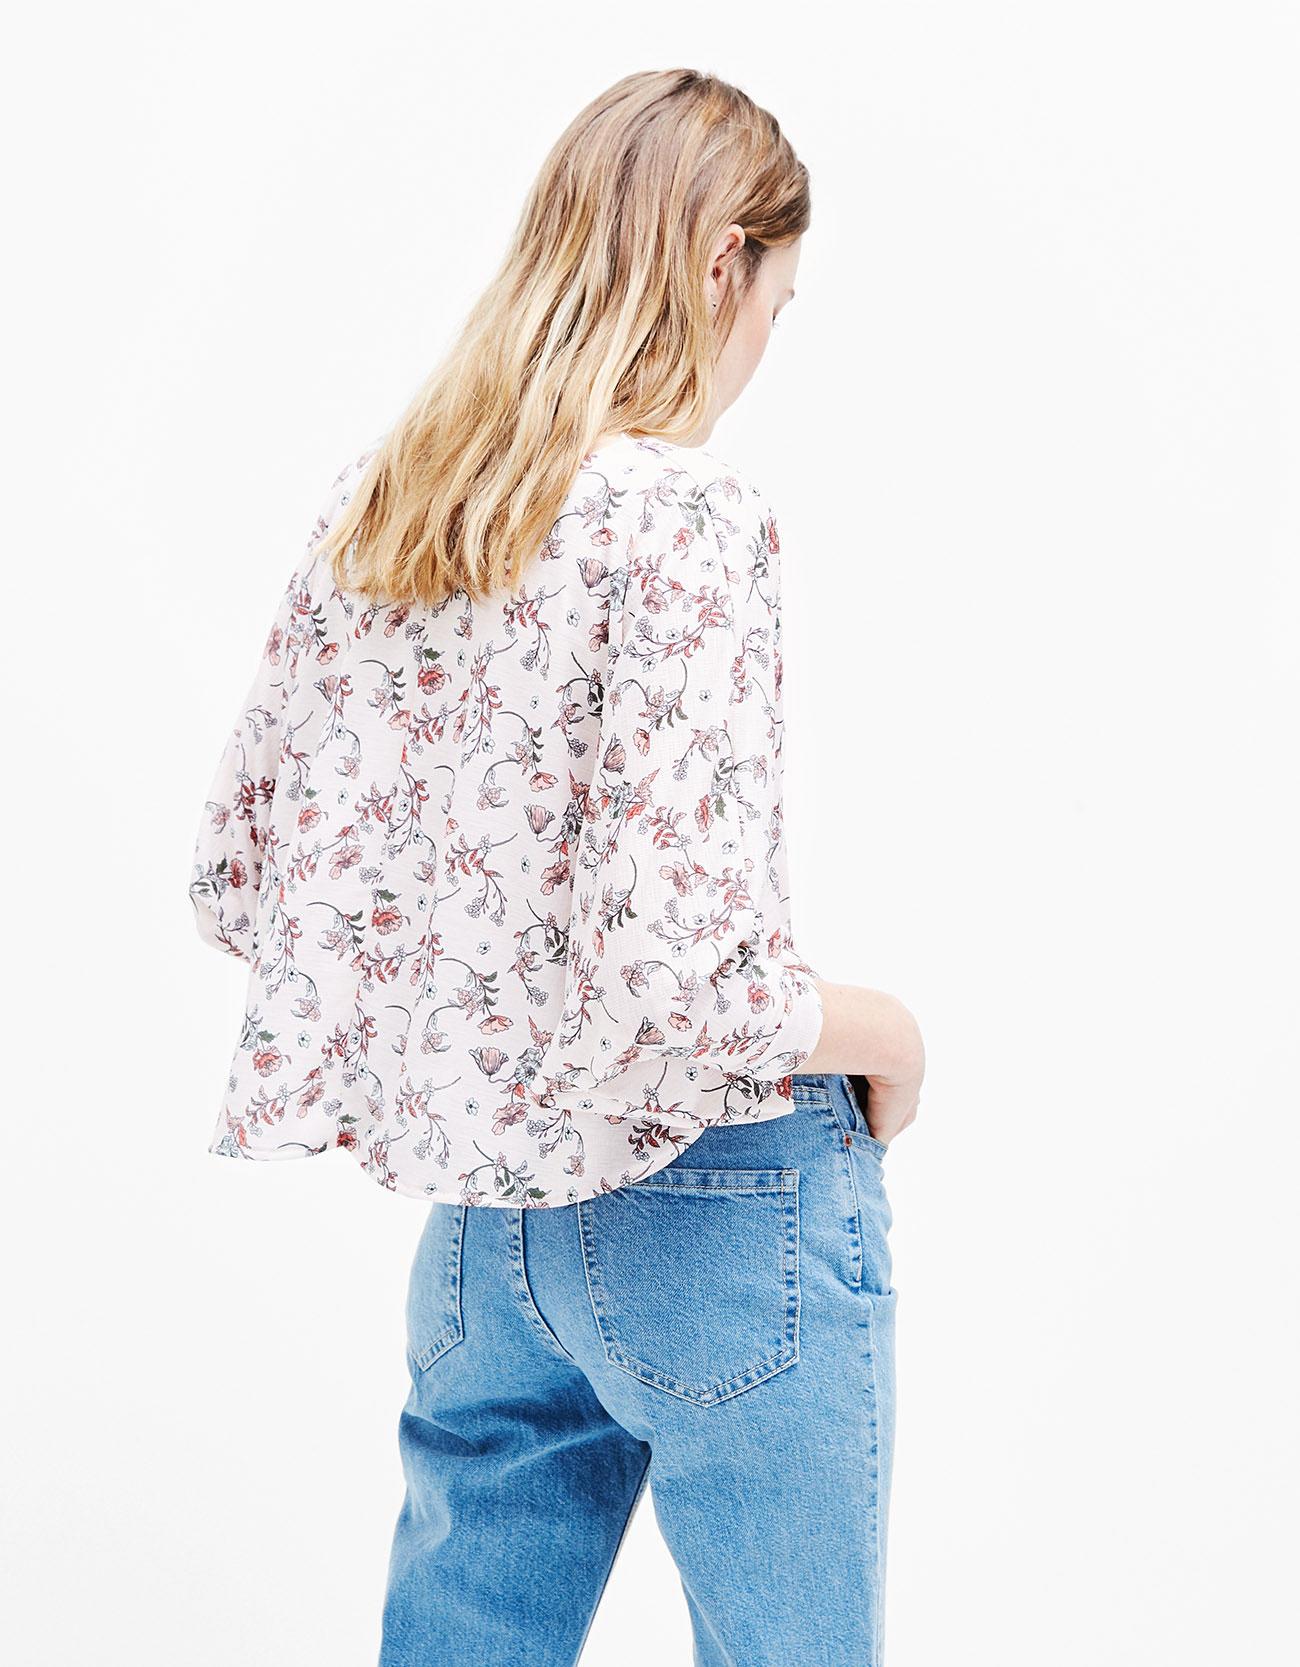 Sayuri Villalba – Bershka – Flowers in Pink2